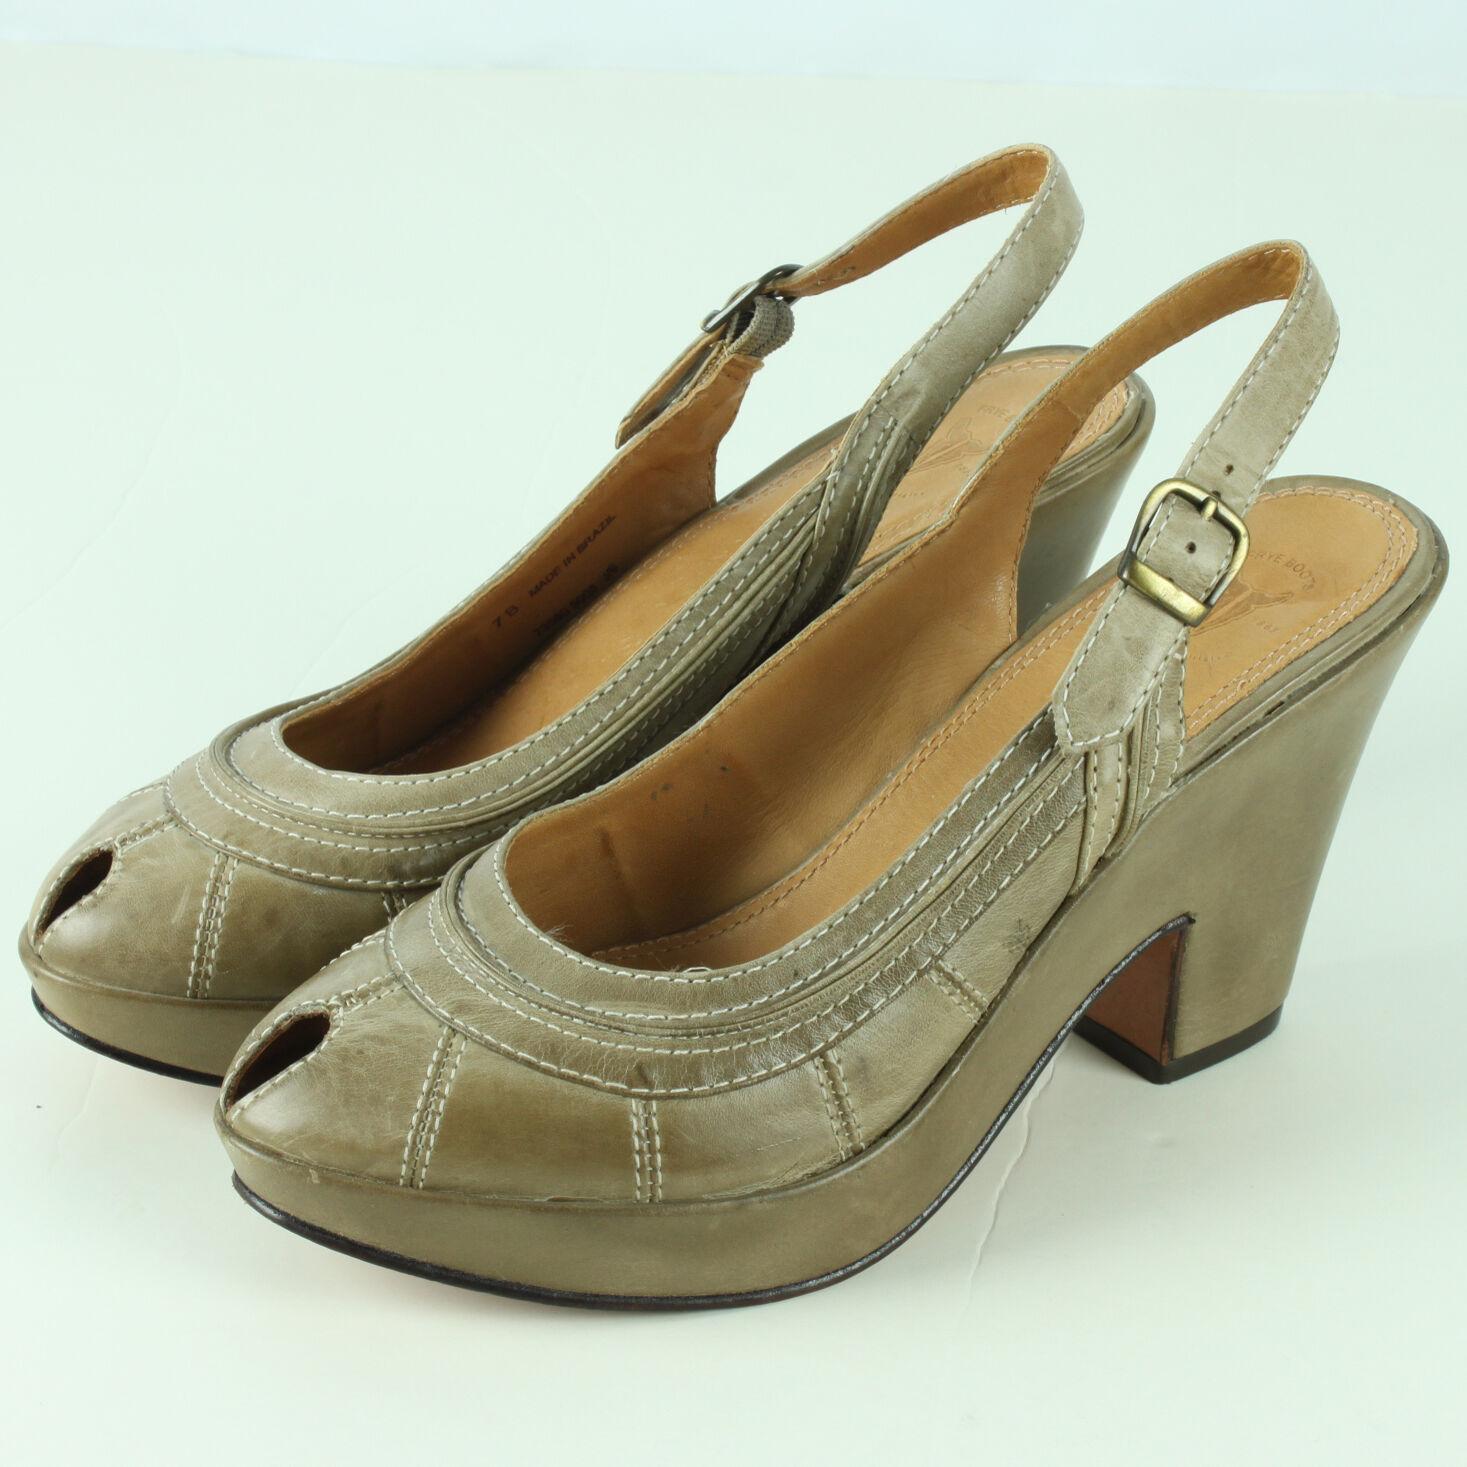 Frye Damenschuhe Größe 7B 7.5 Western Schuhes Peep Toe Slingback 3 Inch Heels Cowboy